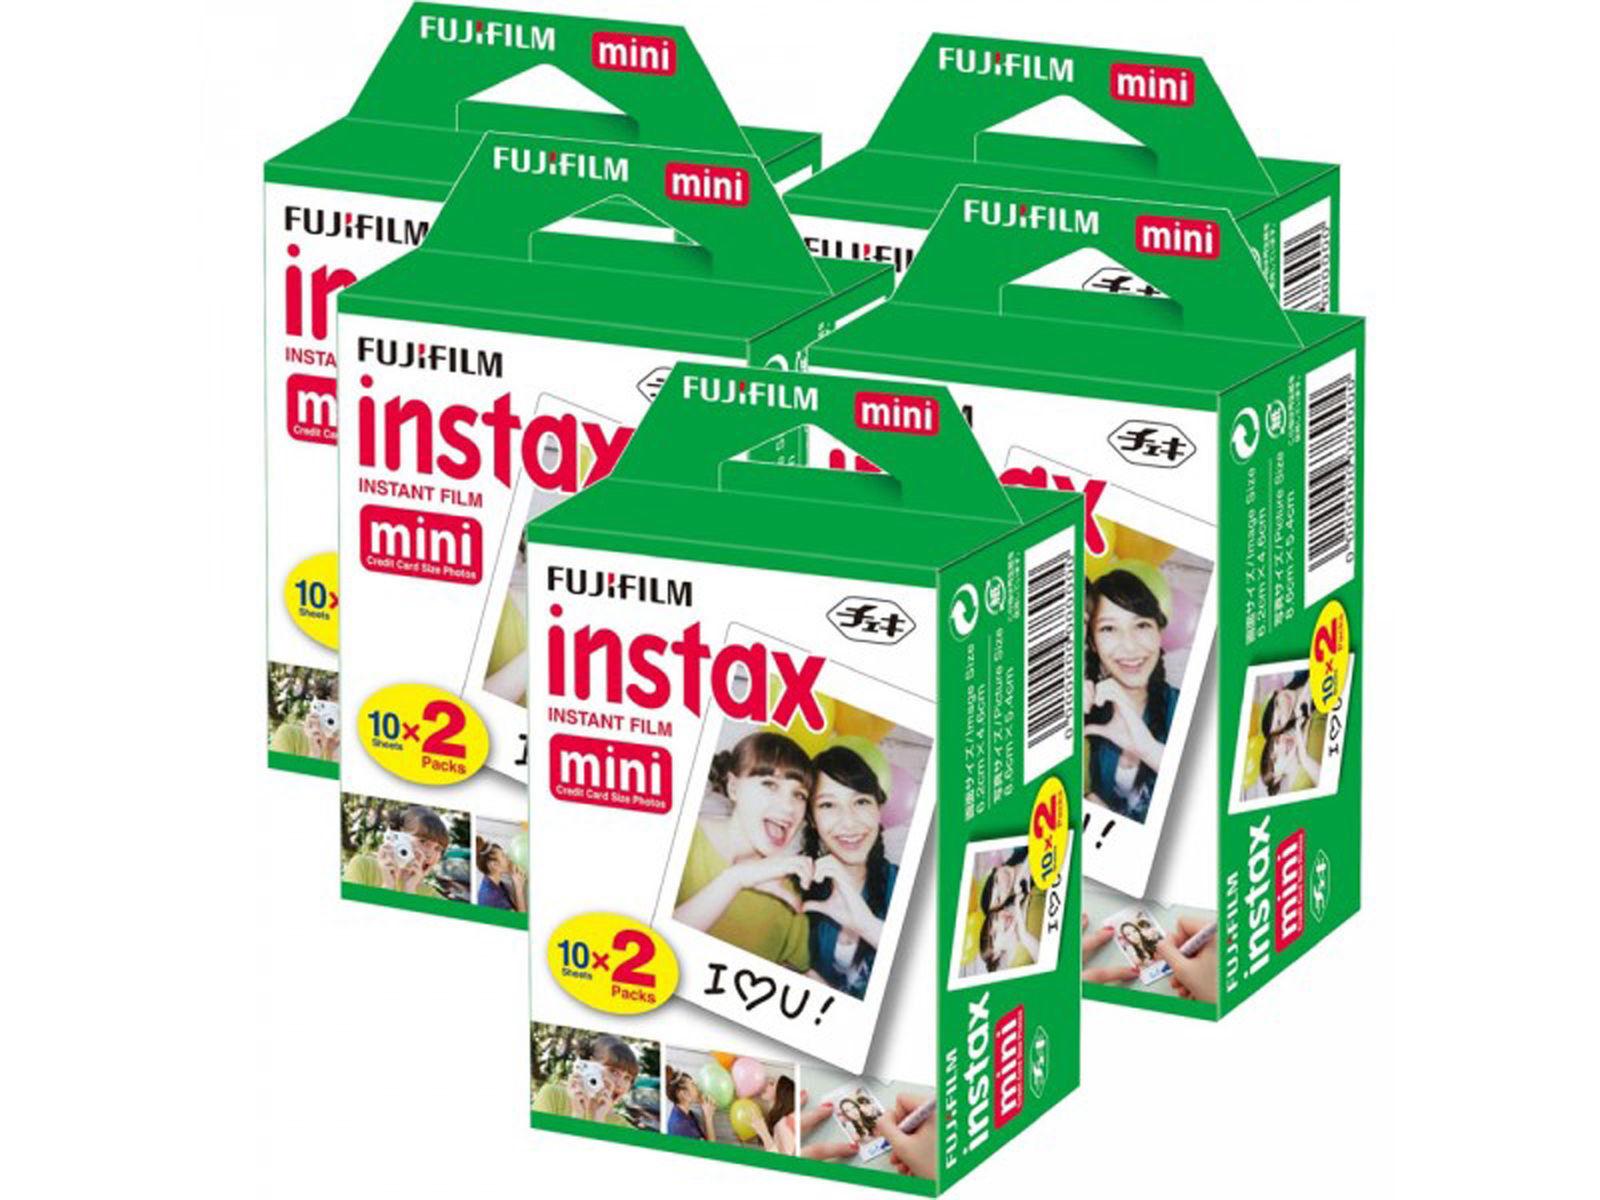 20-40-60-80 & 100 Prints Fujifilm instax instant film For Fuji mini 8 & 9 Camera -   10 - 20-40-60-80 & 100 Prints Fujifilm instax instant film For Fuji mini 8 & 9 Camera